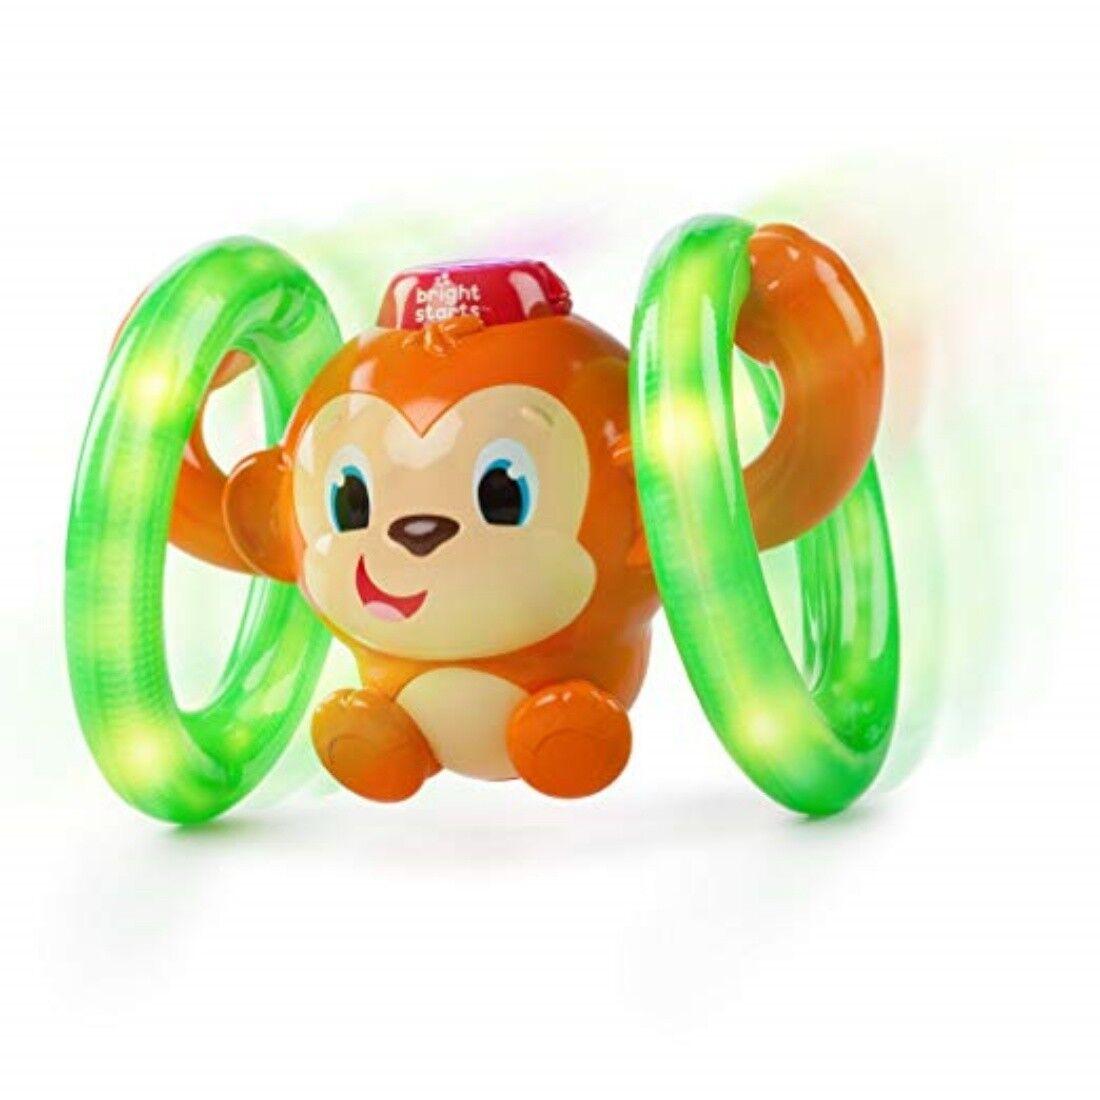 Bright Starts Lights Baby Roll Glow Monkey